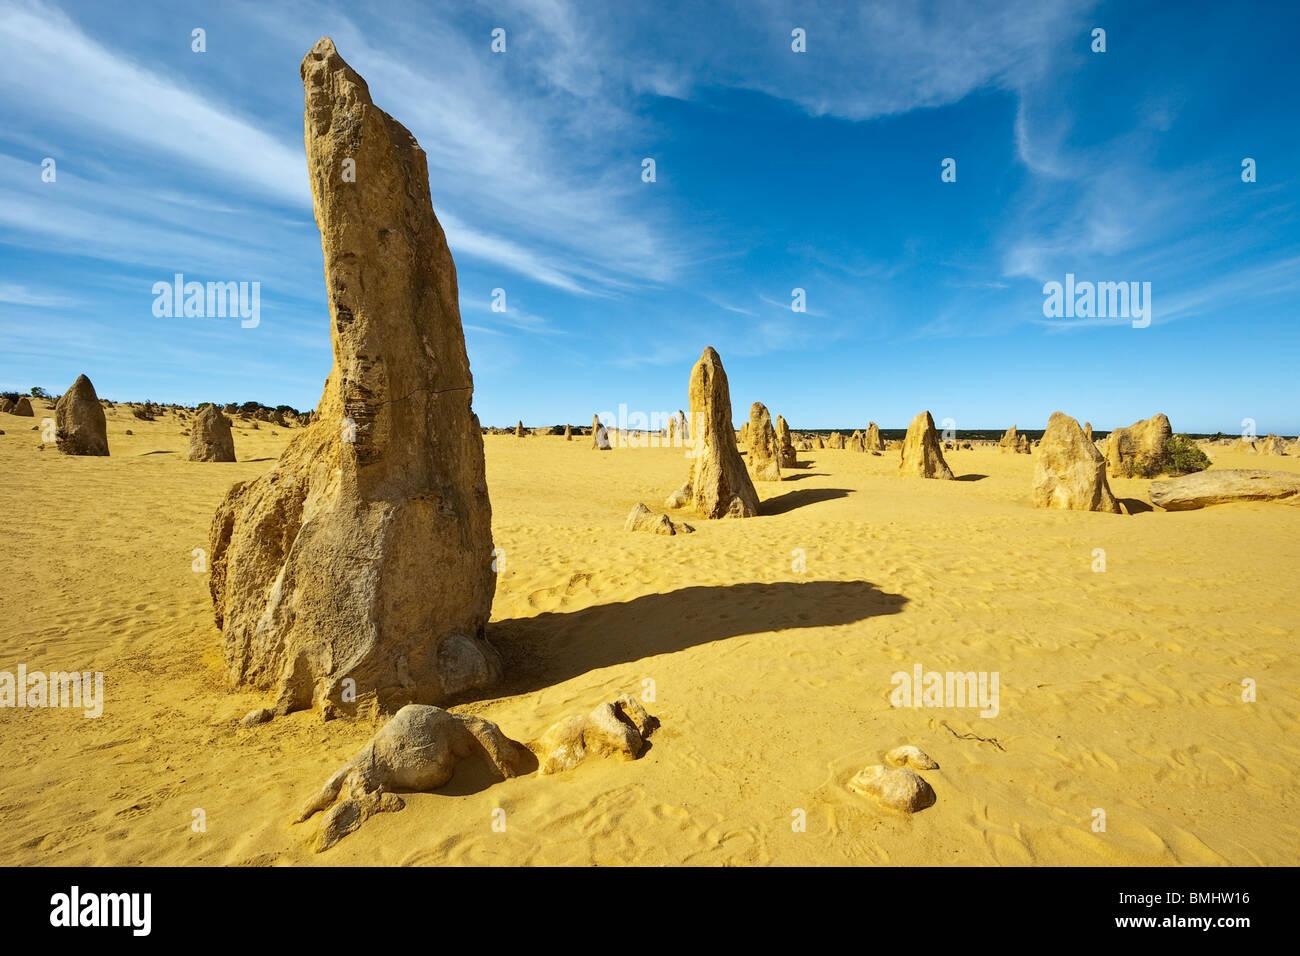 Desert Rock Pillars : Rock pillars of eroded limestone in the pinnacles desert